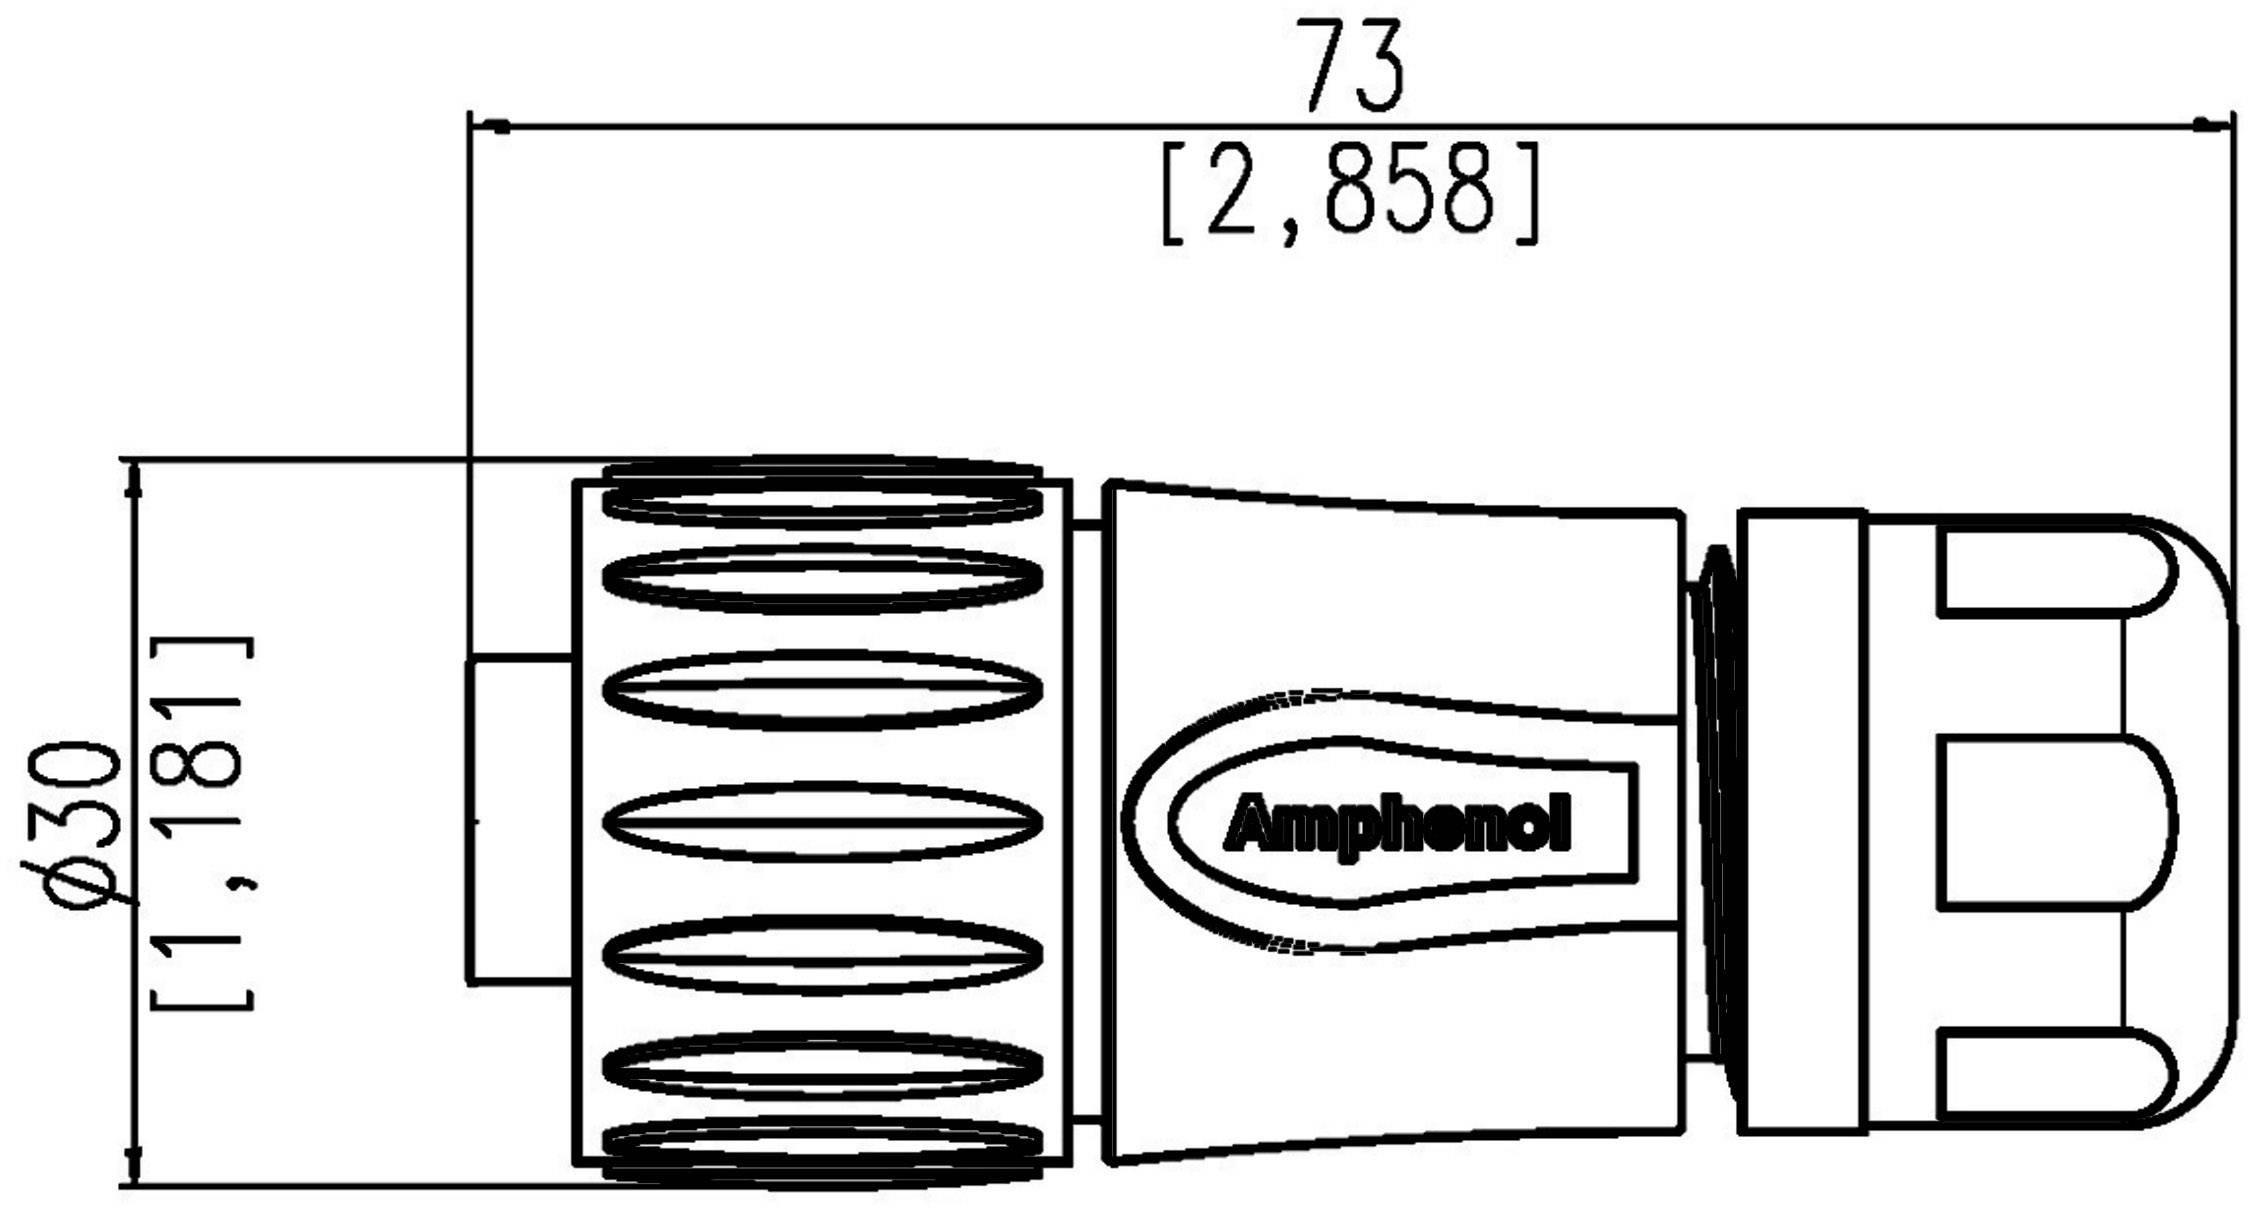 Amphenol C016 30D006 110 12 IP67 (v zablokovanom stave), polyamid 6.6, pólů + PE, 1 ks